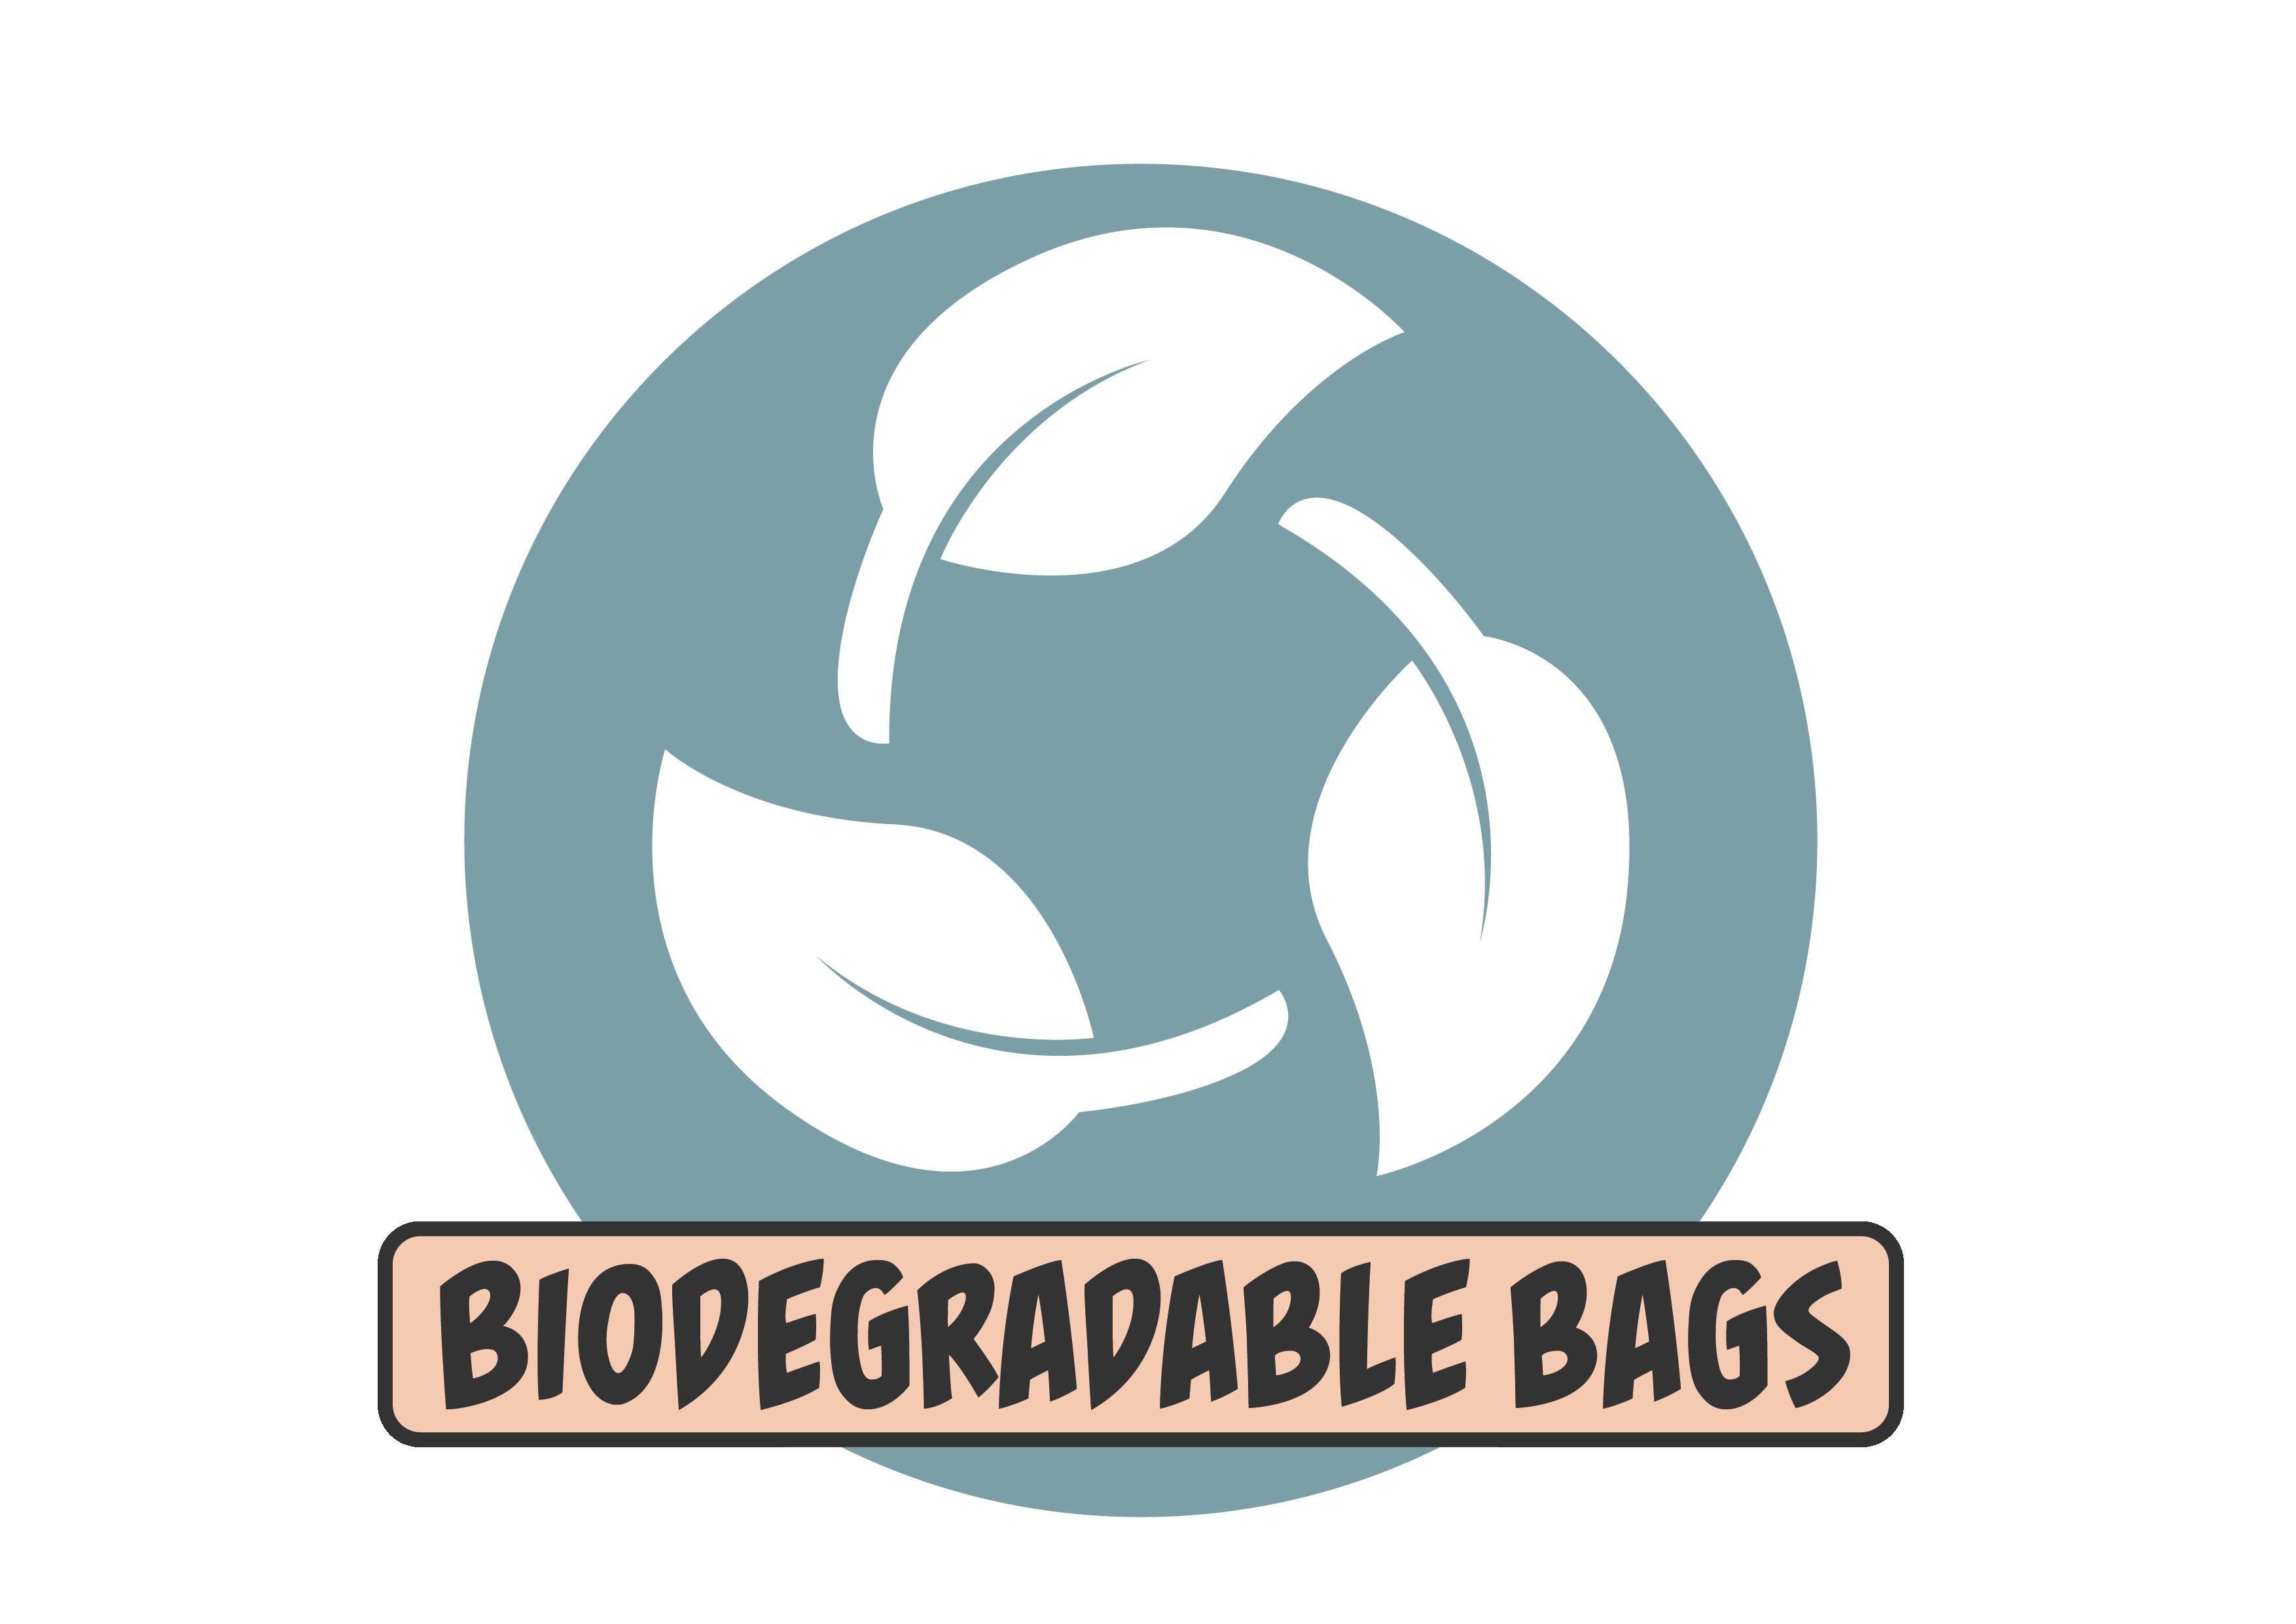 biodegradable bags-01